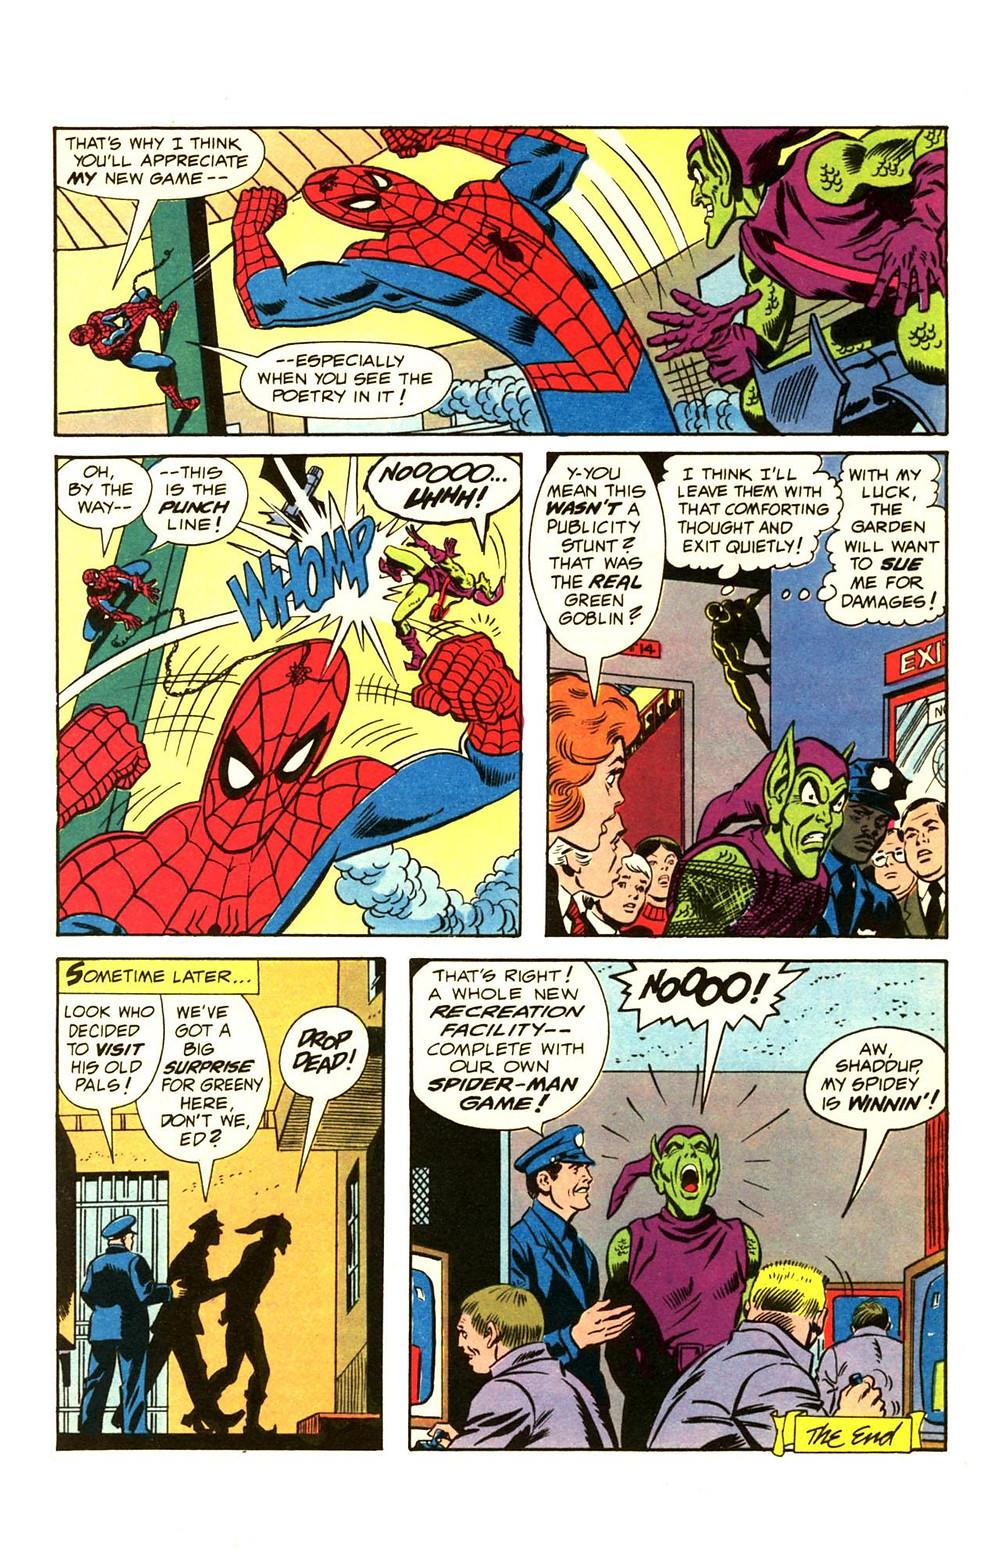 Marvel Blip magazine Spiderman Atari 2600 game ad